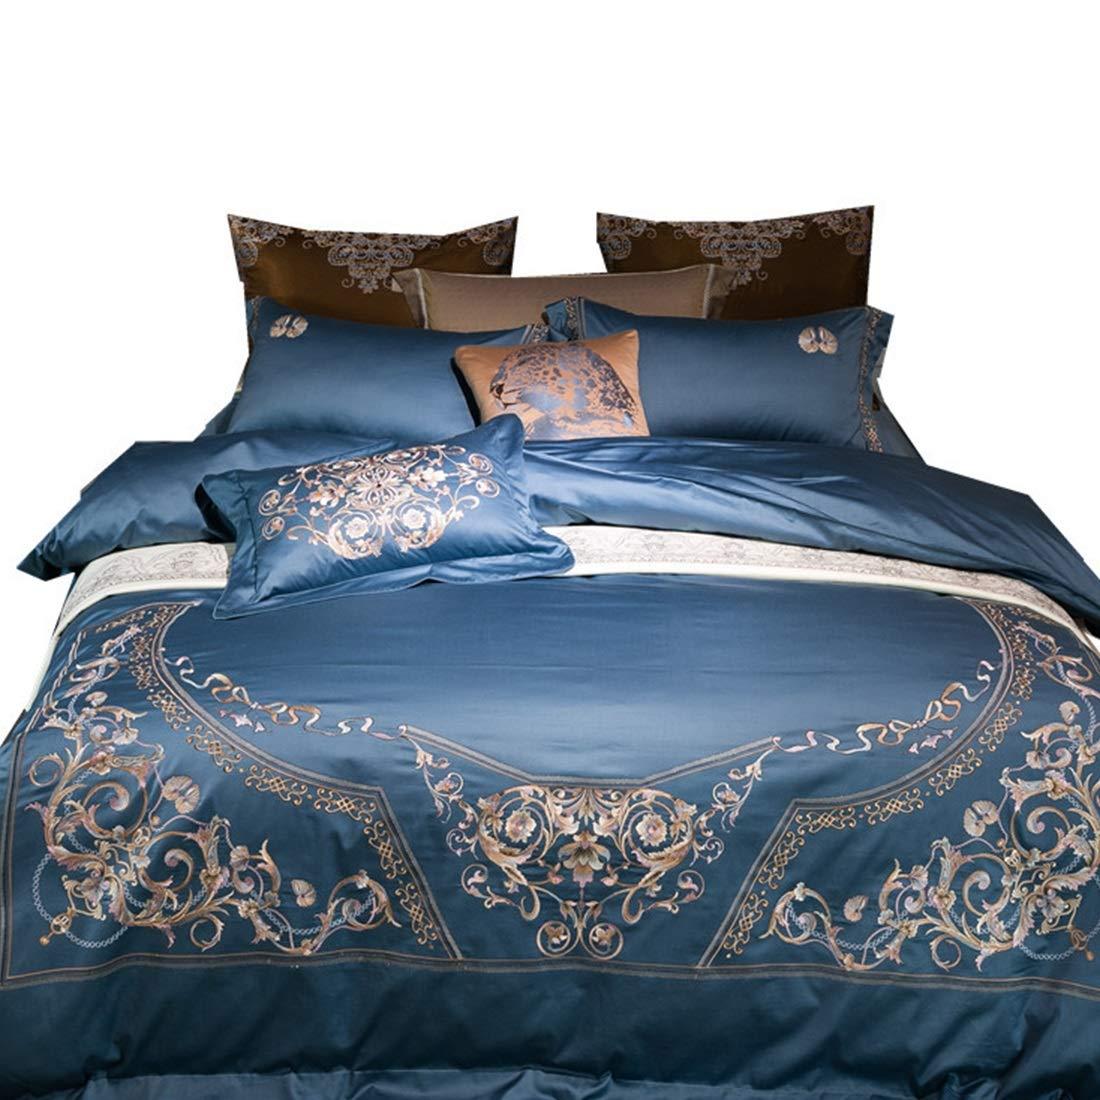 Koloeplf シンプルなブルーのハイエンド刺繍入り純綿ロングステープル綿の寝具4セット (Size : QUEEN) B07NXPCLQ4  Queen